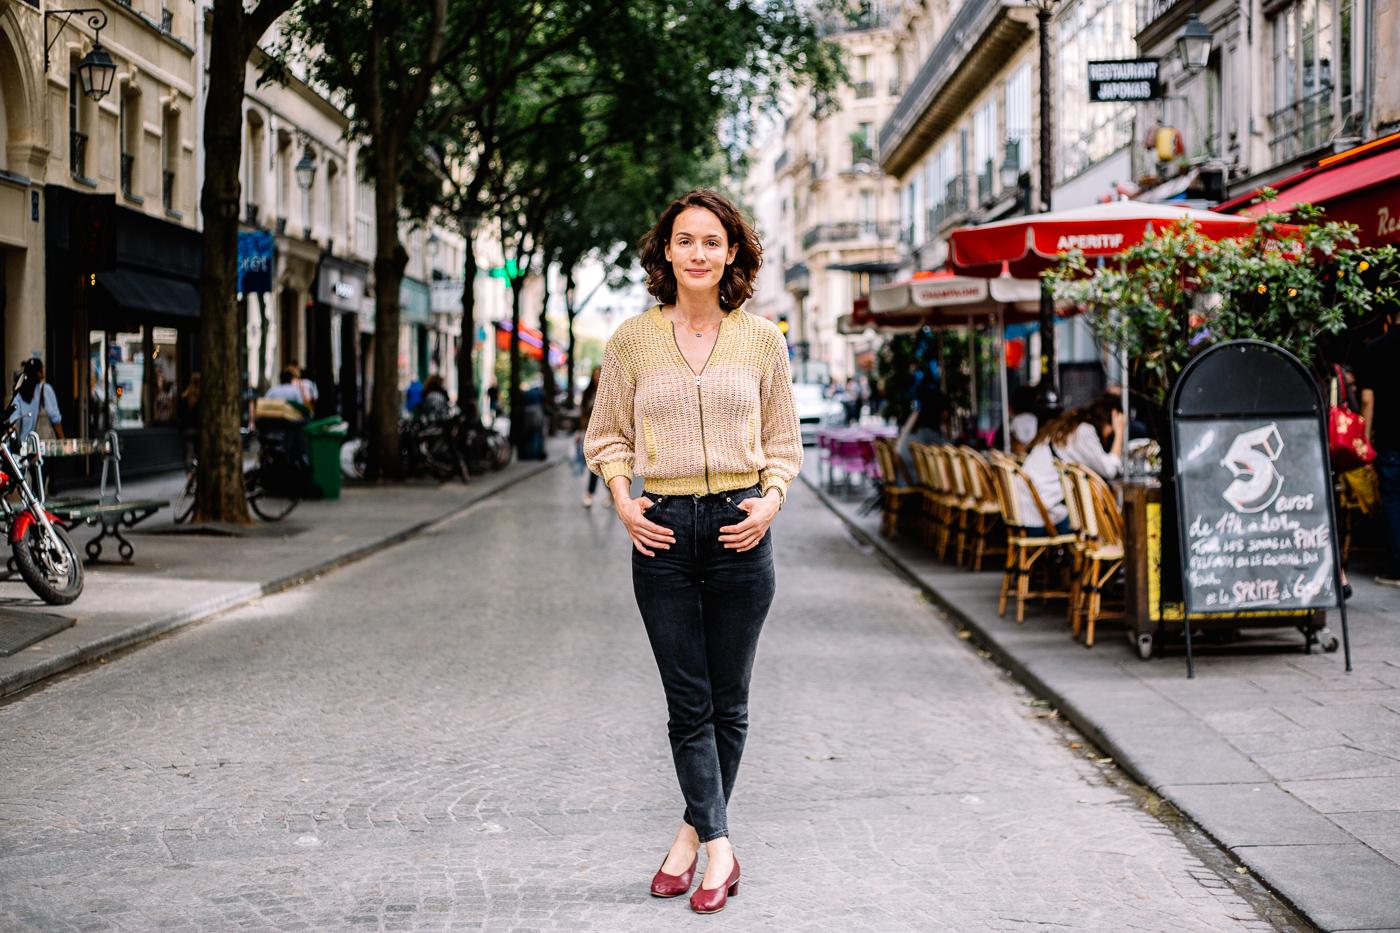 Sophie Rioufol rue Montmartre